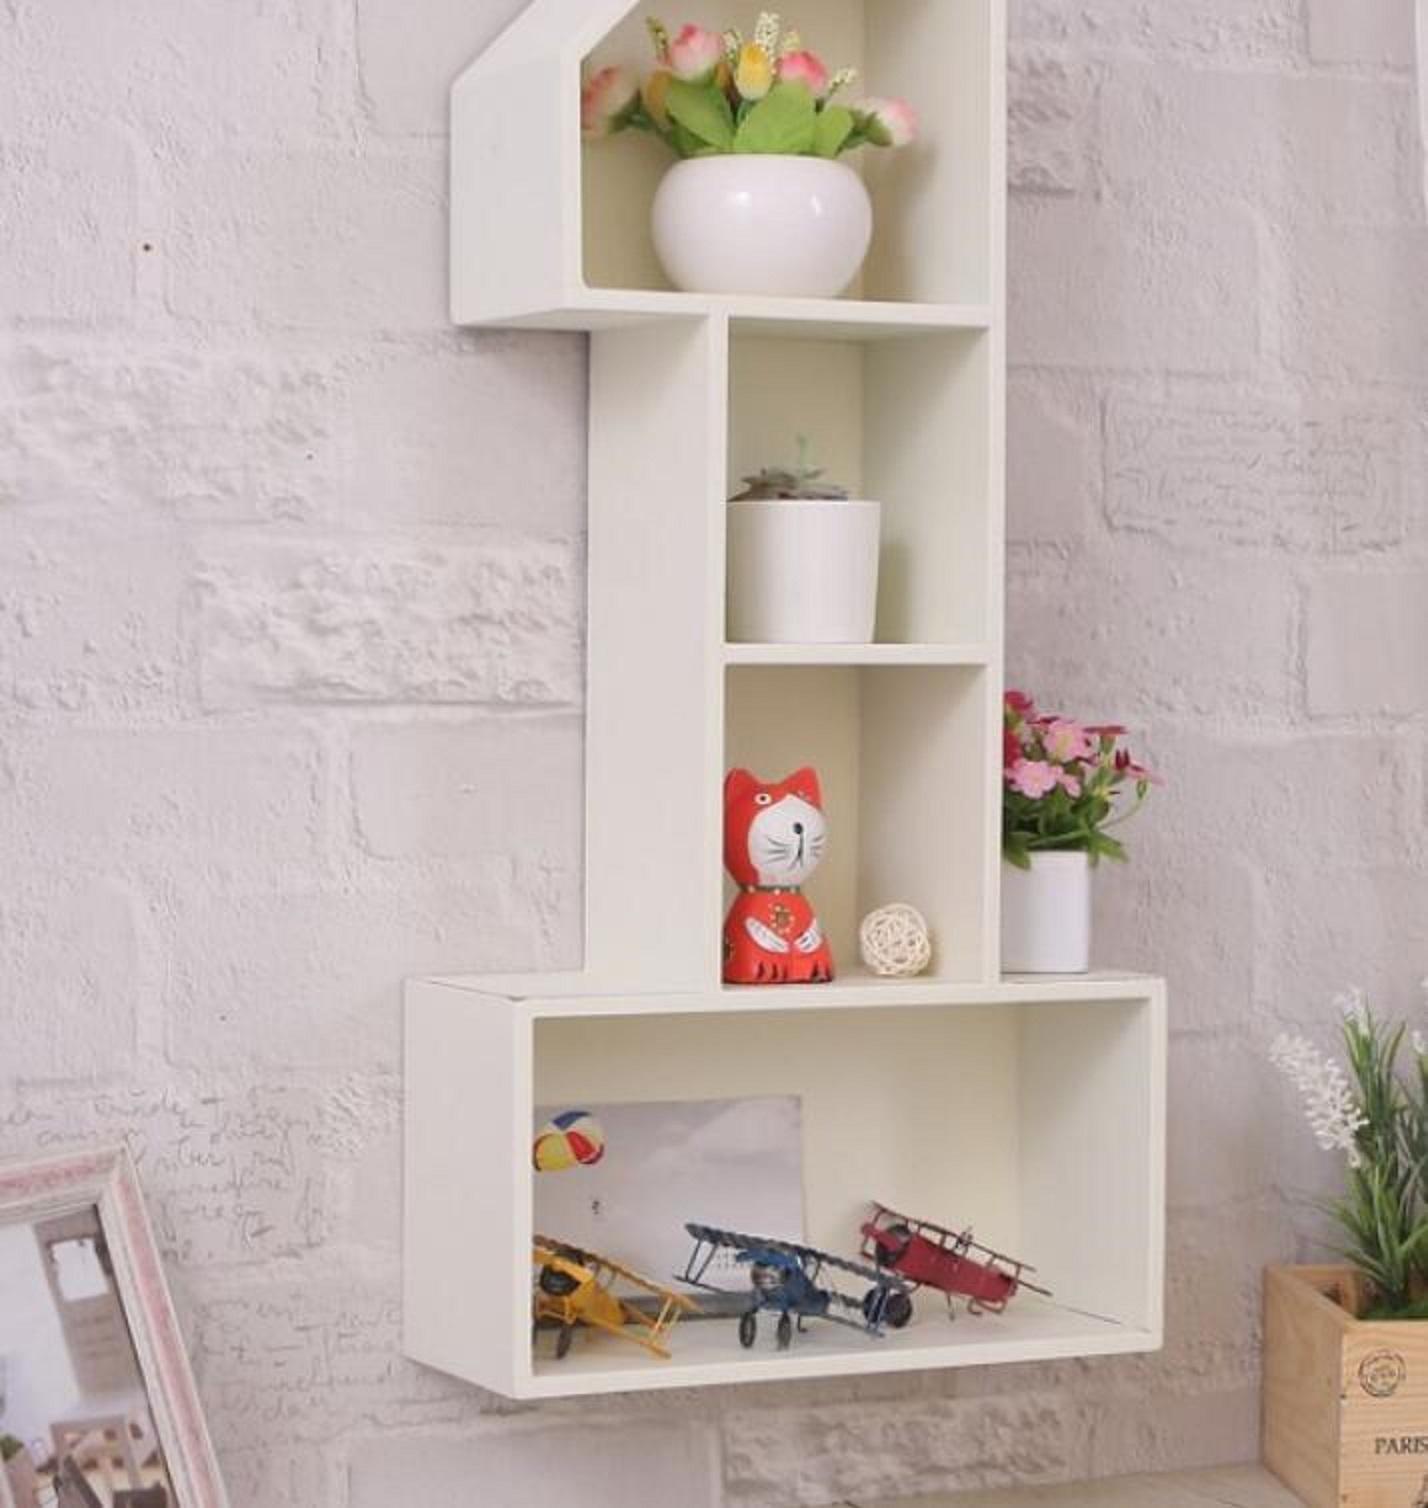 Simple retro wood wall racks home storage living room bedroom wall decoration 301160cm , white